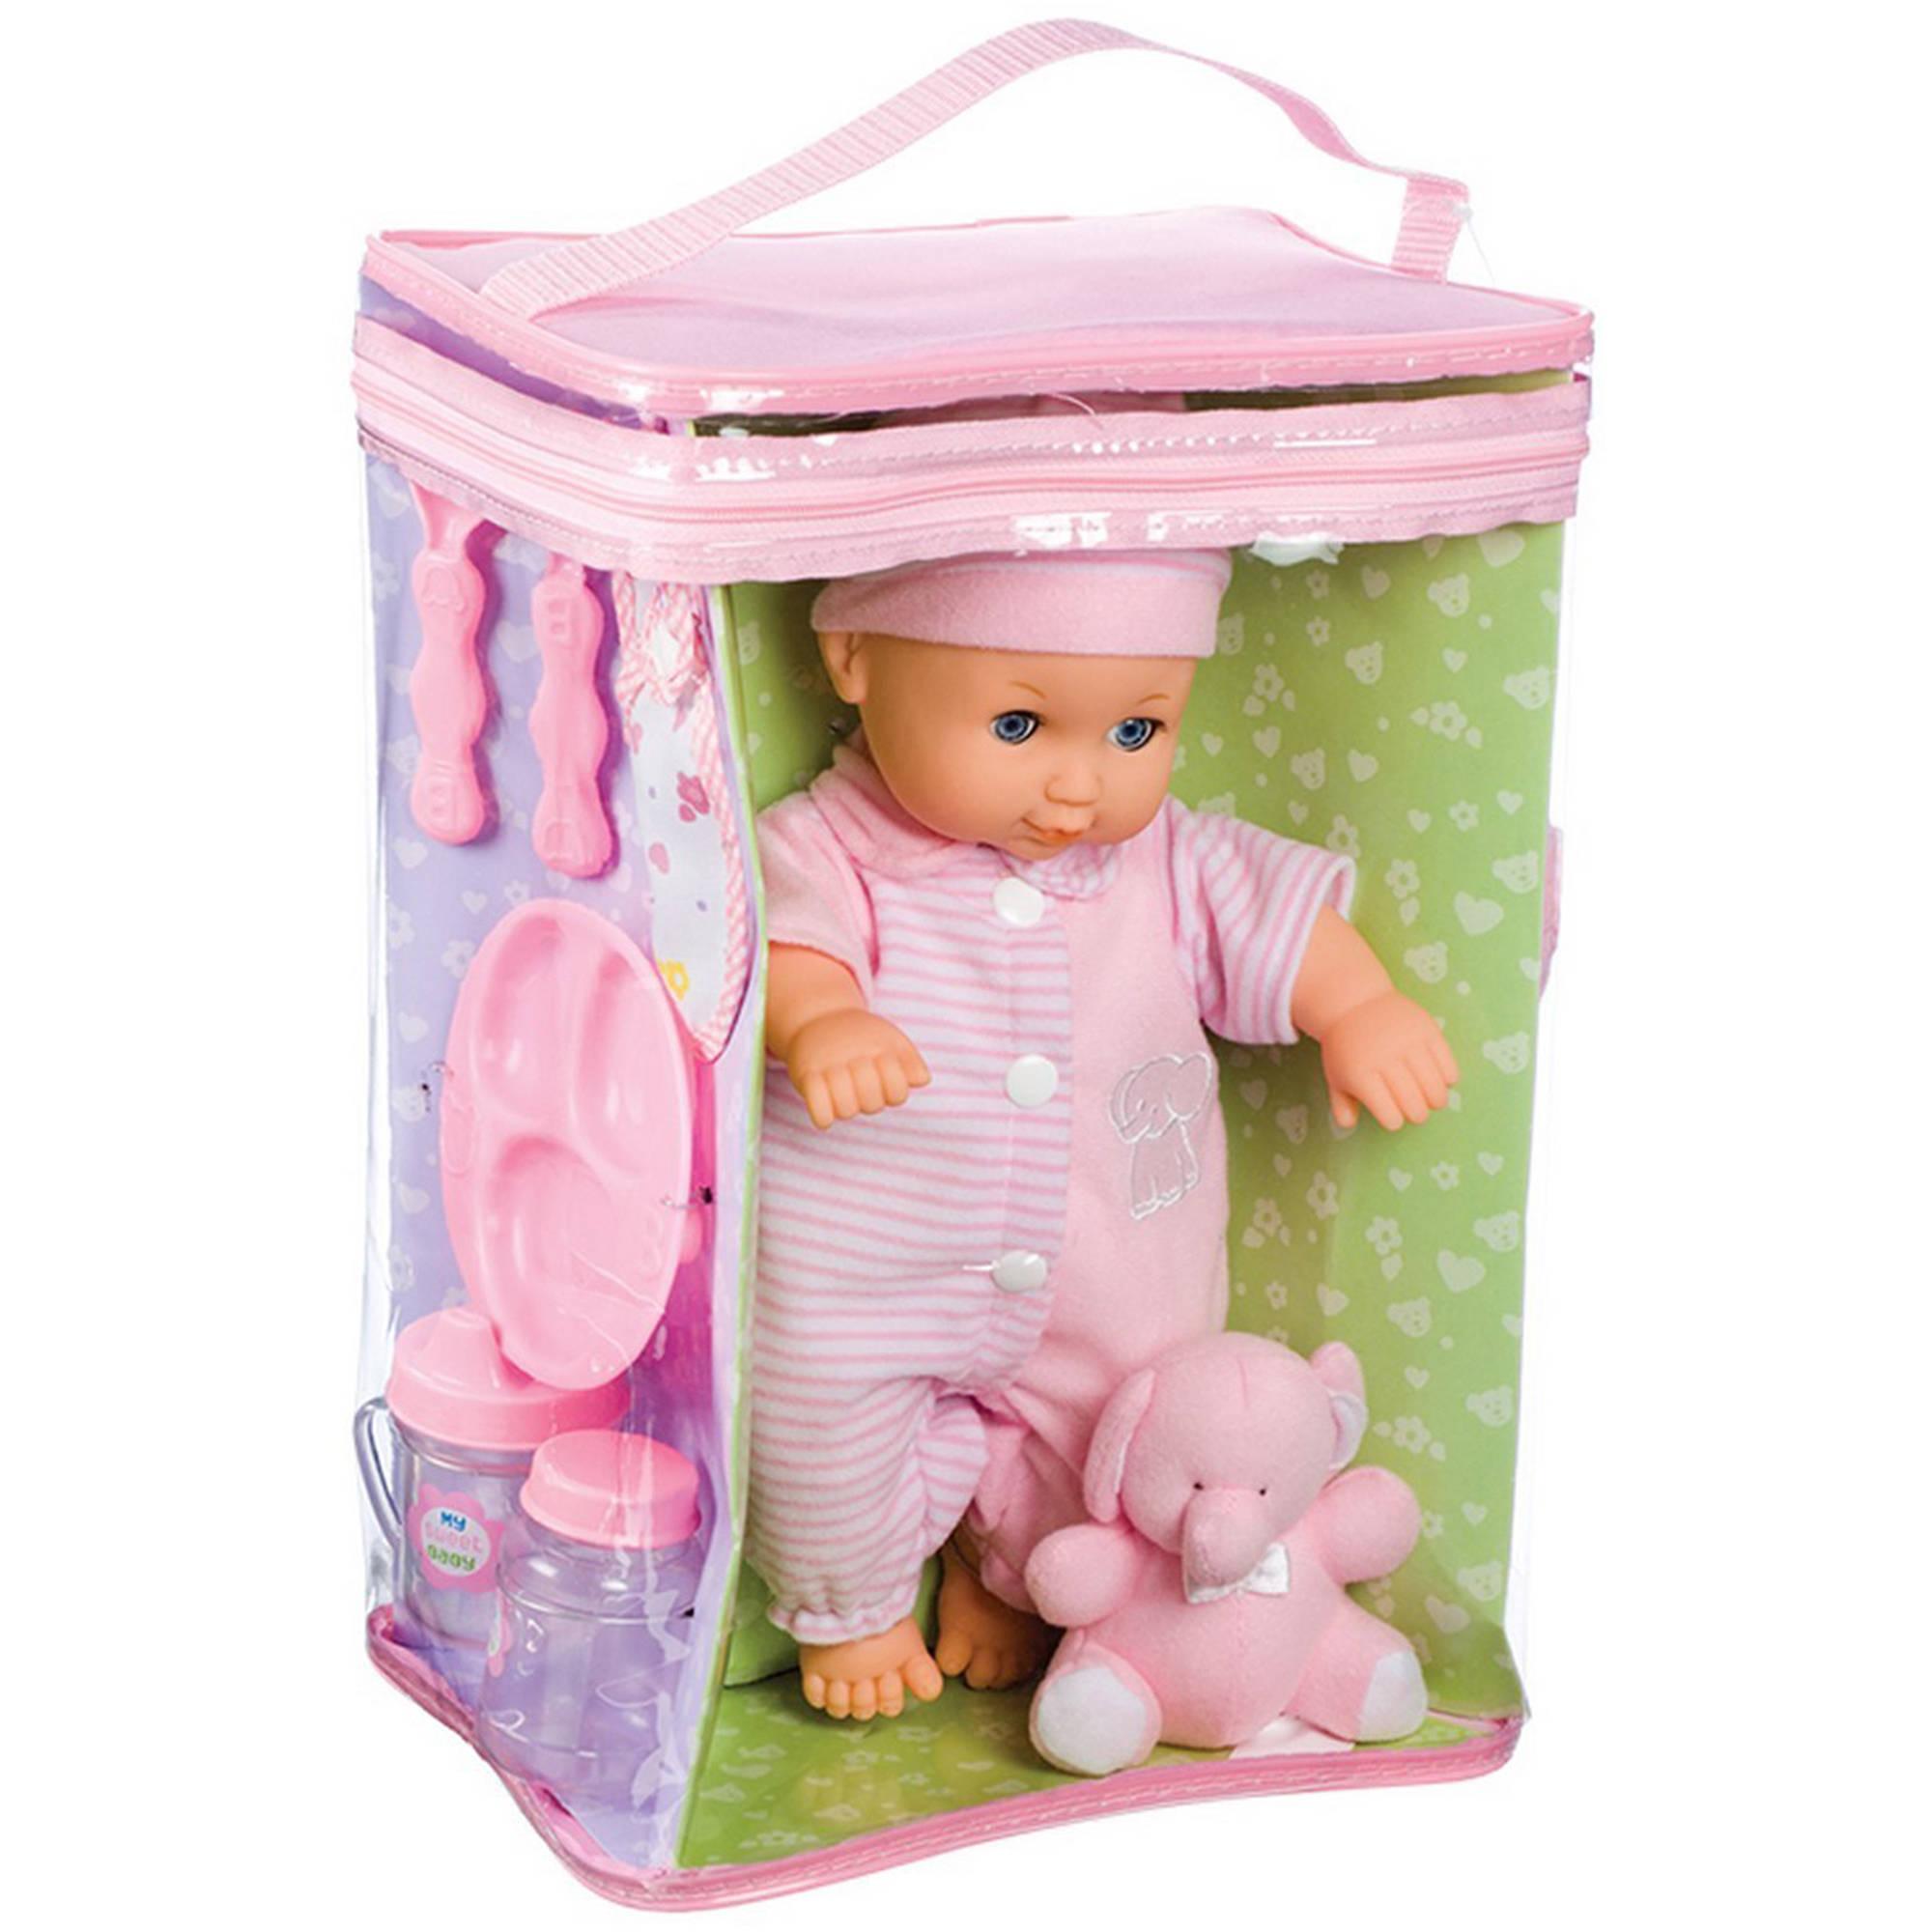 "Toysmith Deluxe Baby Ensemble 11.5"" Doll Playset"